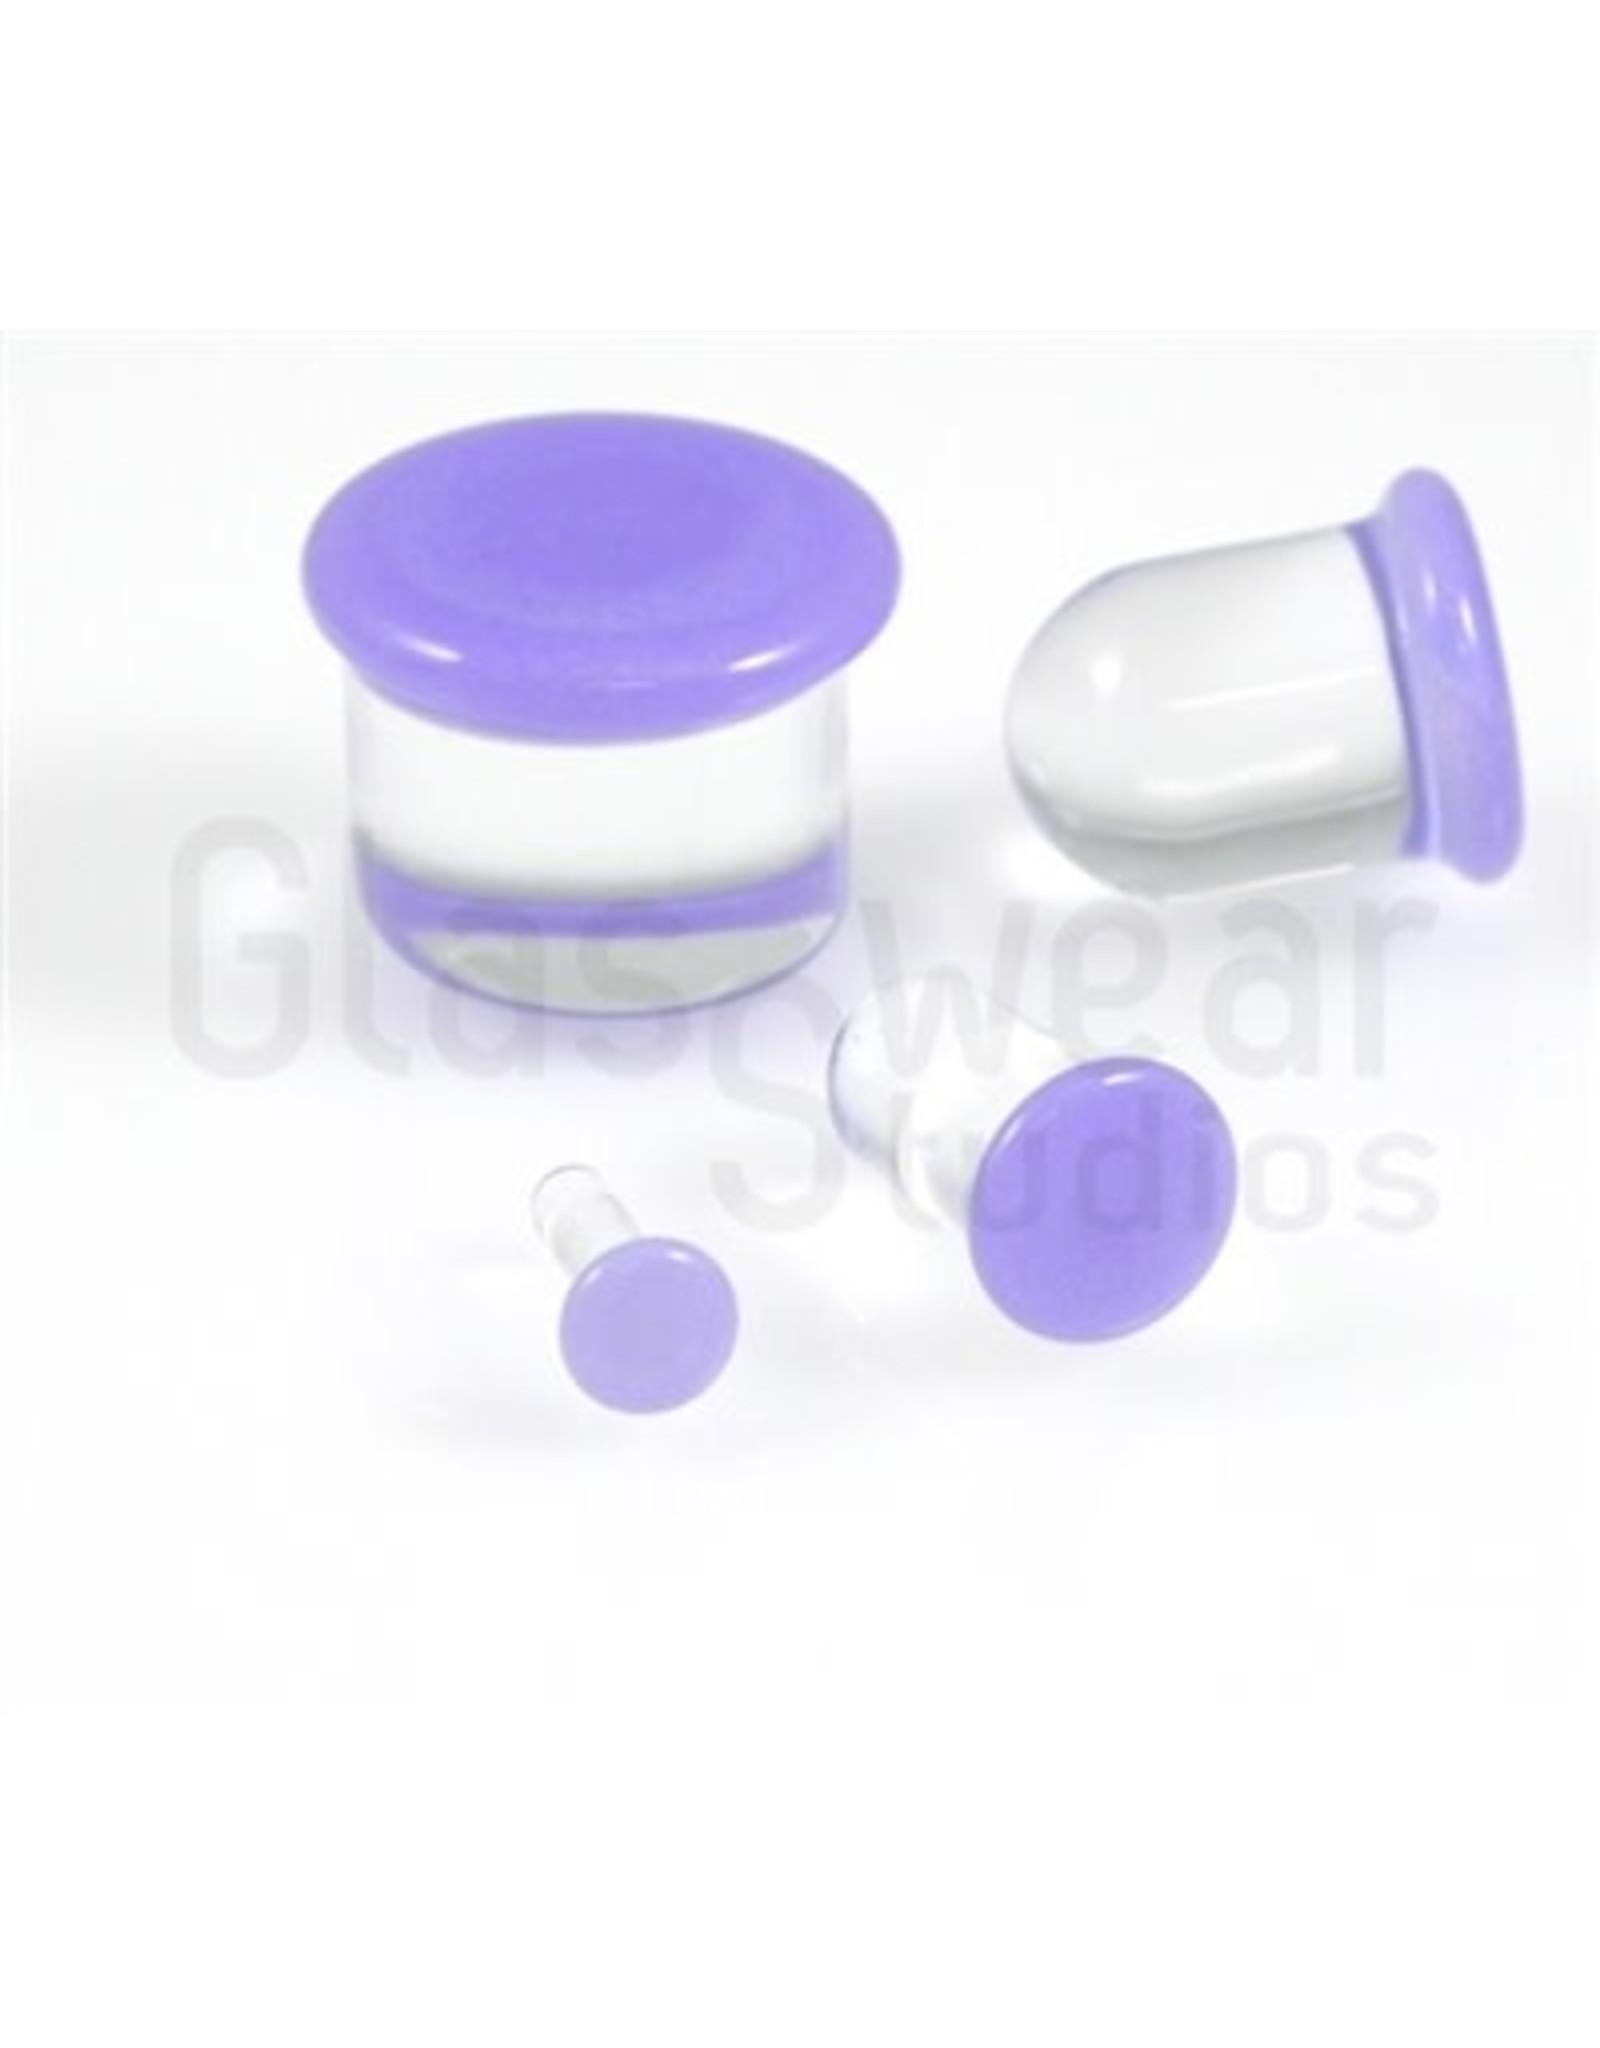 4G-5mm SF Glass Plugs